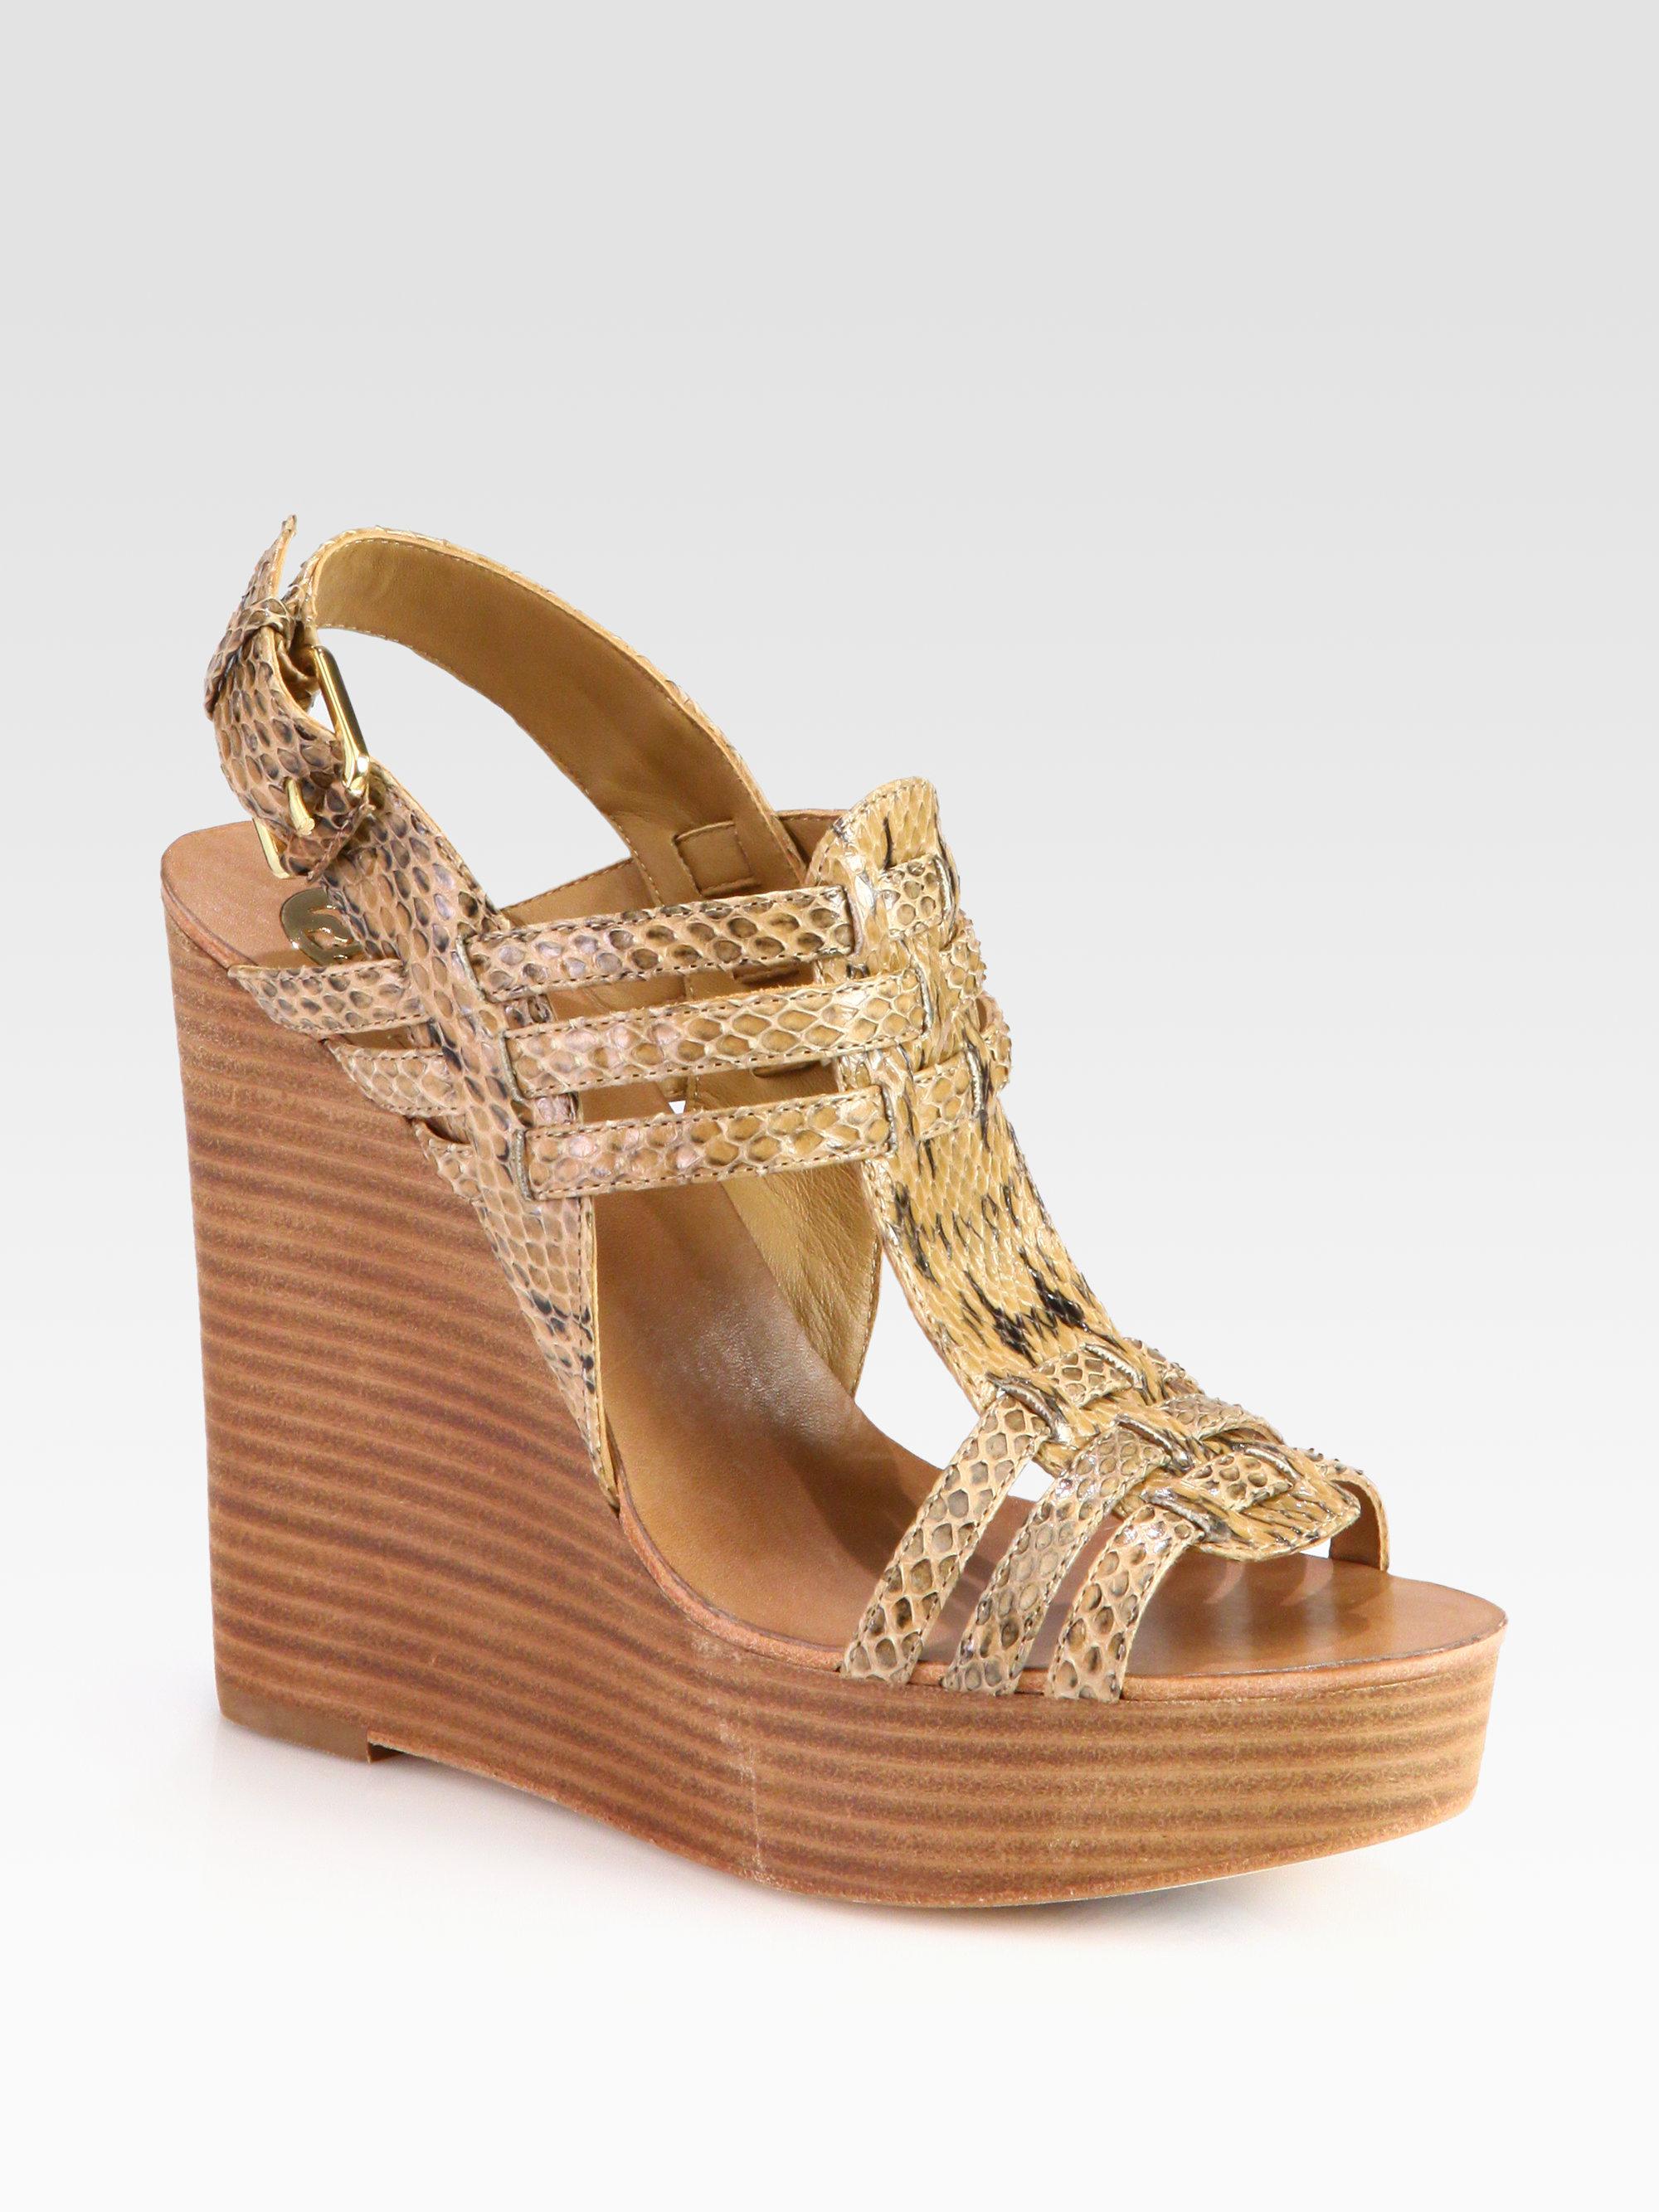 6c3b4c2598719 Lyst - Tory Burch Leslie Snakeskin Wedge Sandals in Natural